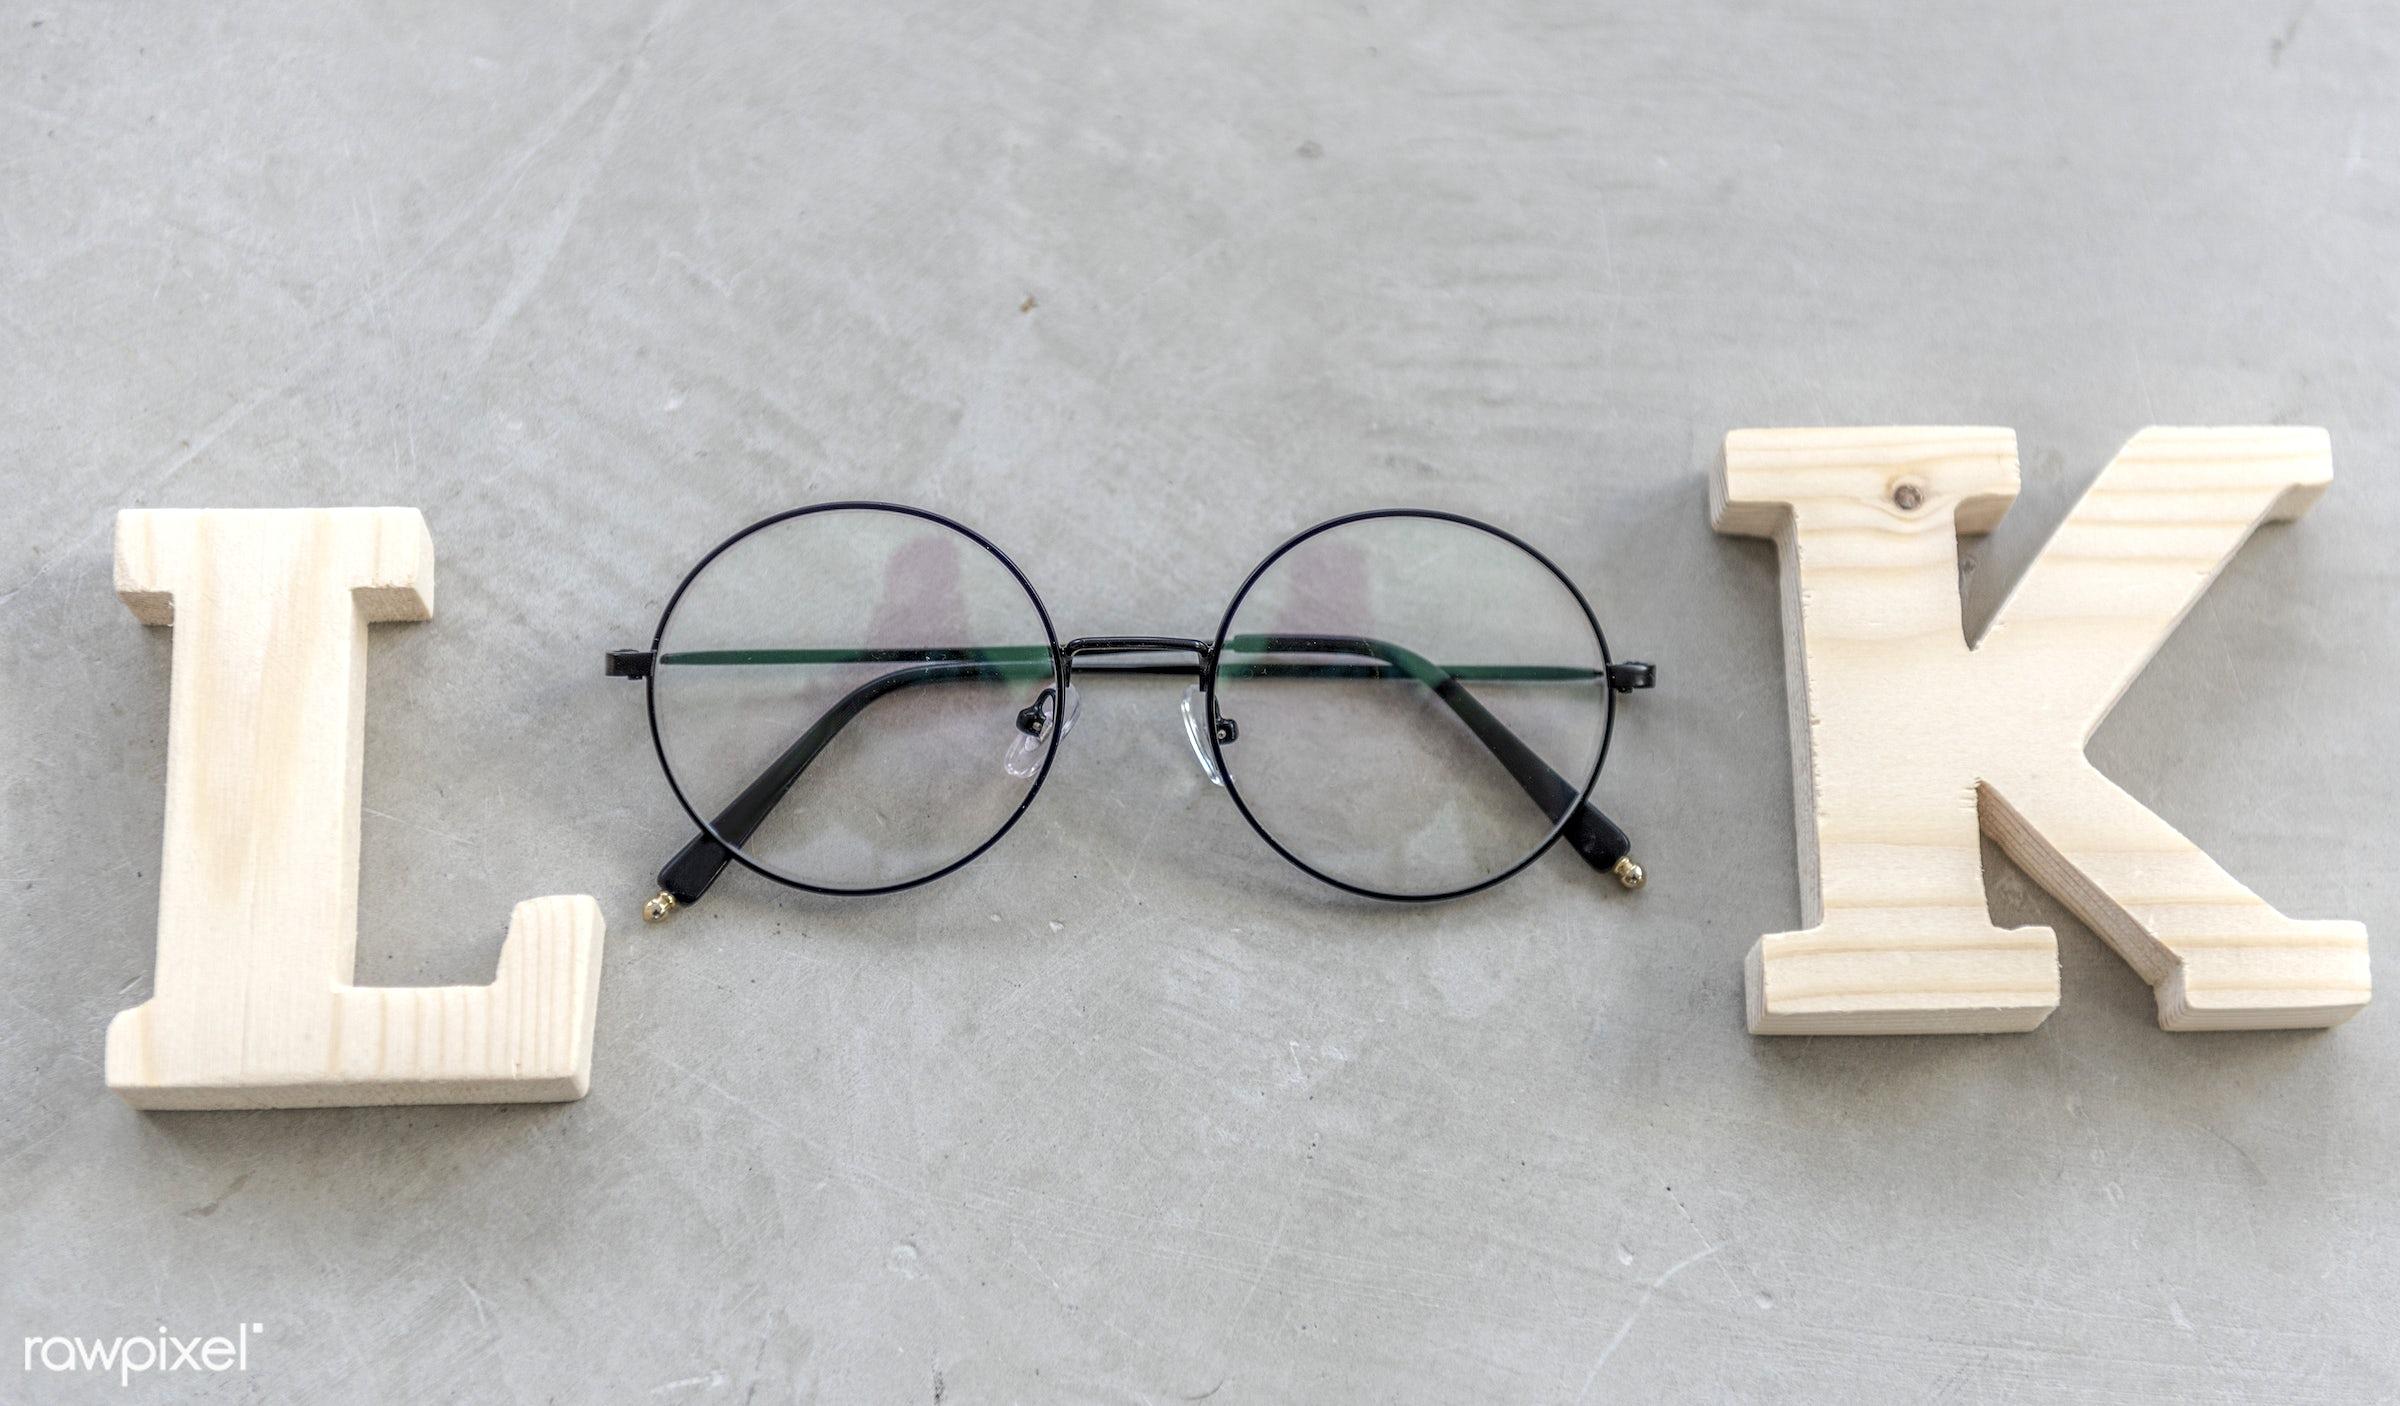 aerial, alphabets, eyeglasses, flatlay, isolated, look, nobody, object, term, word, flat lay